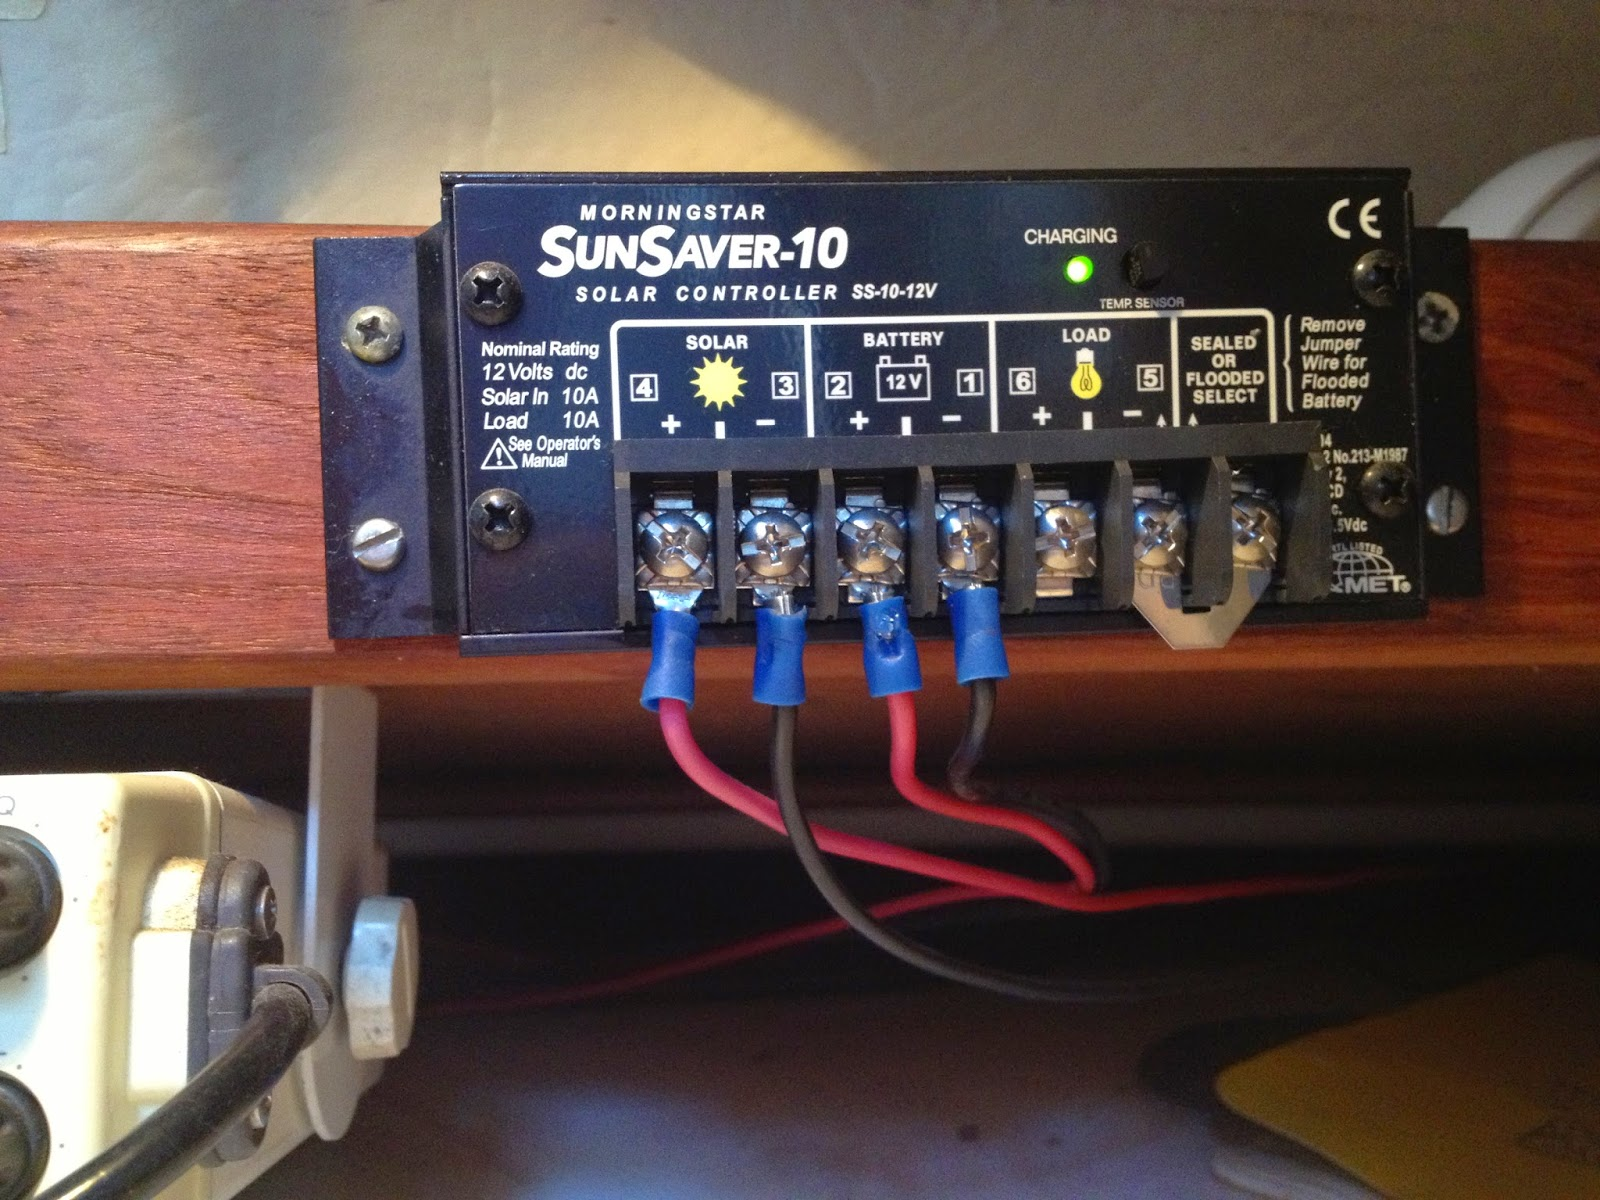 Solar Panel Wiring Diagram Uk Fujitsu Halcyon Captain Curran 39s Sailing Blog Panels For Boats An